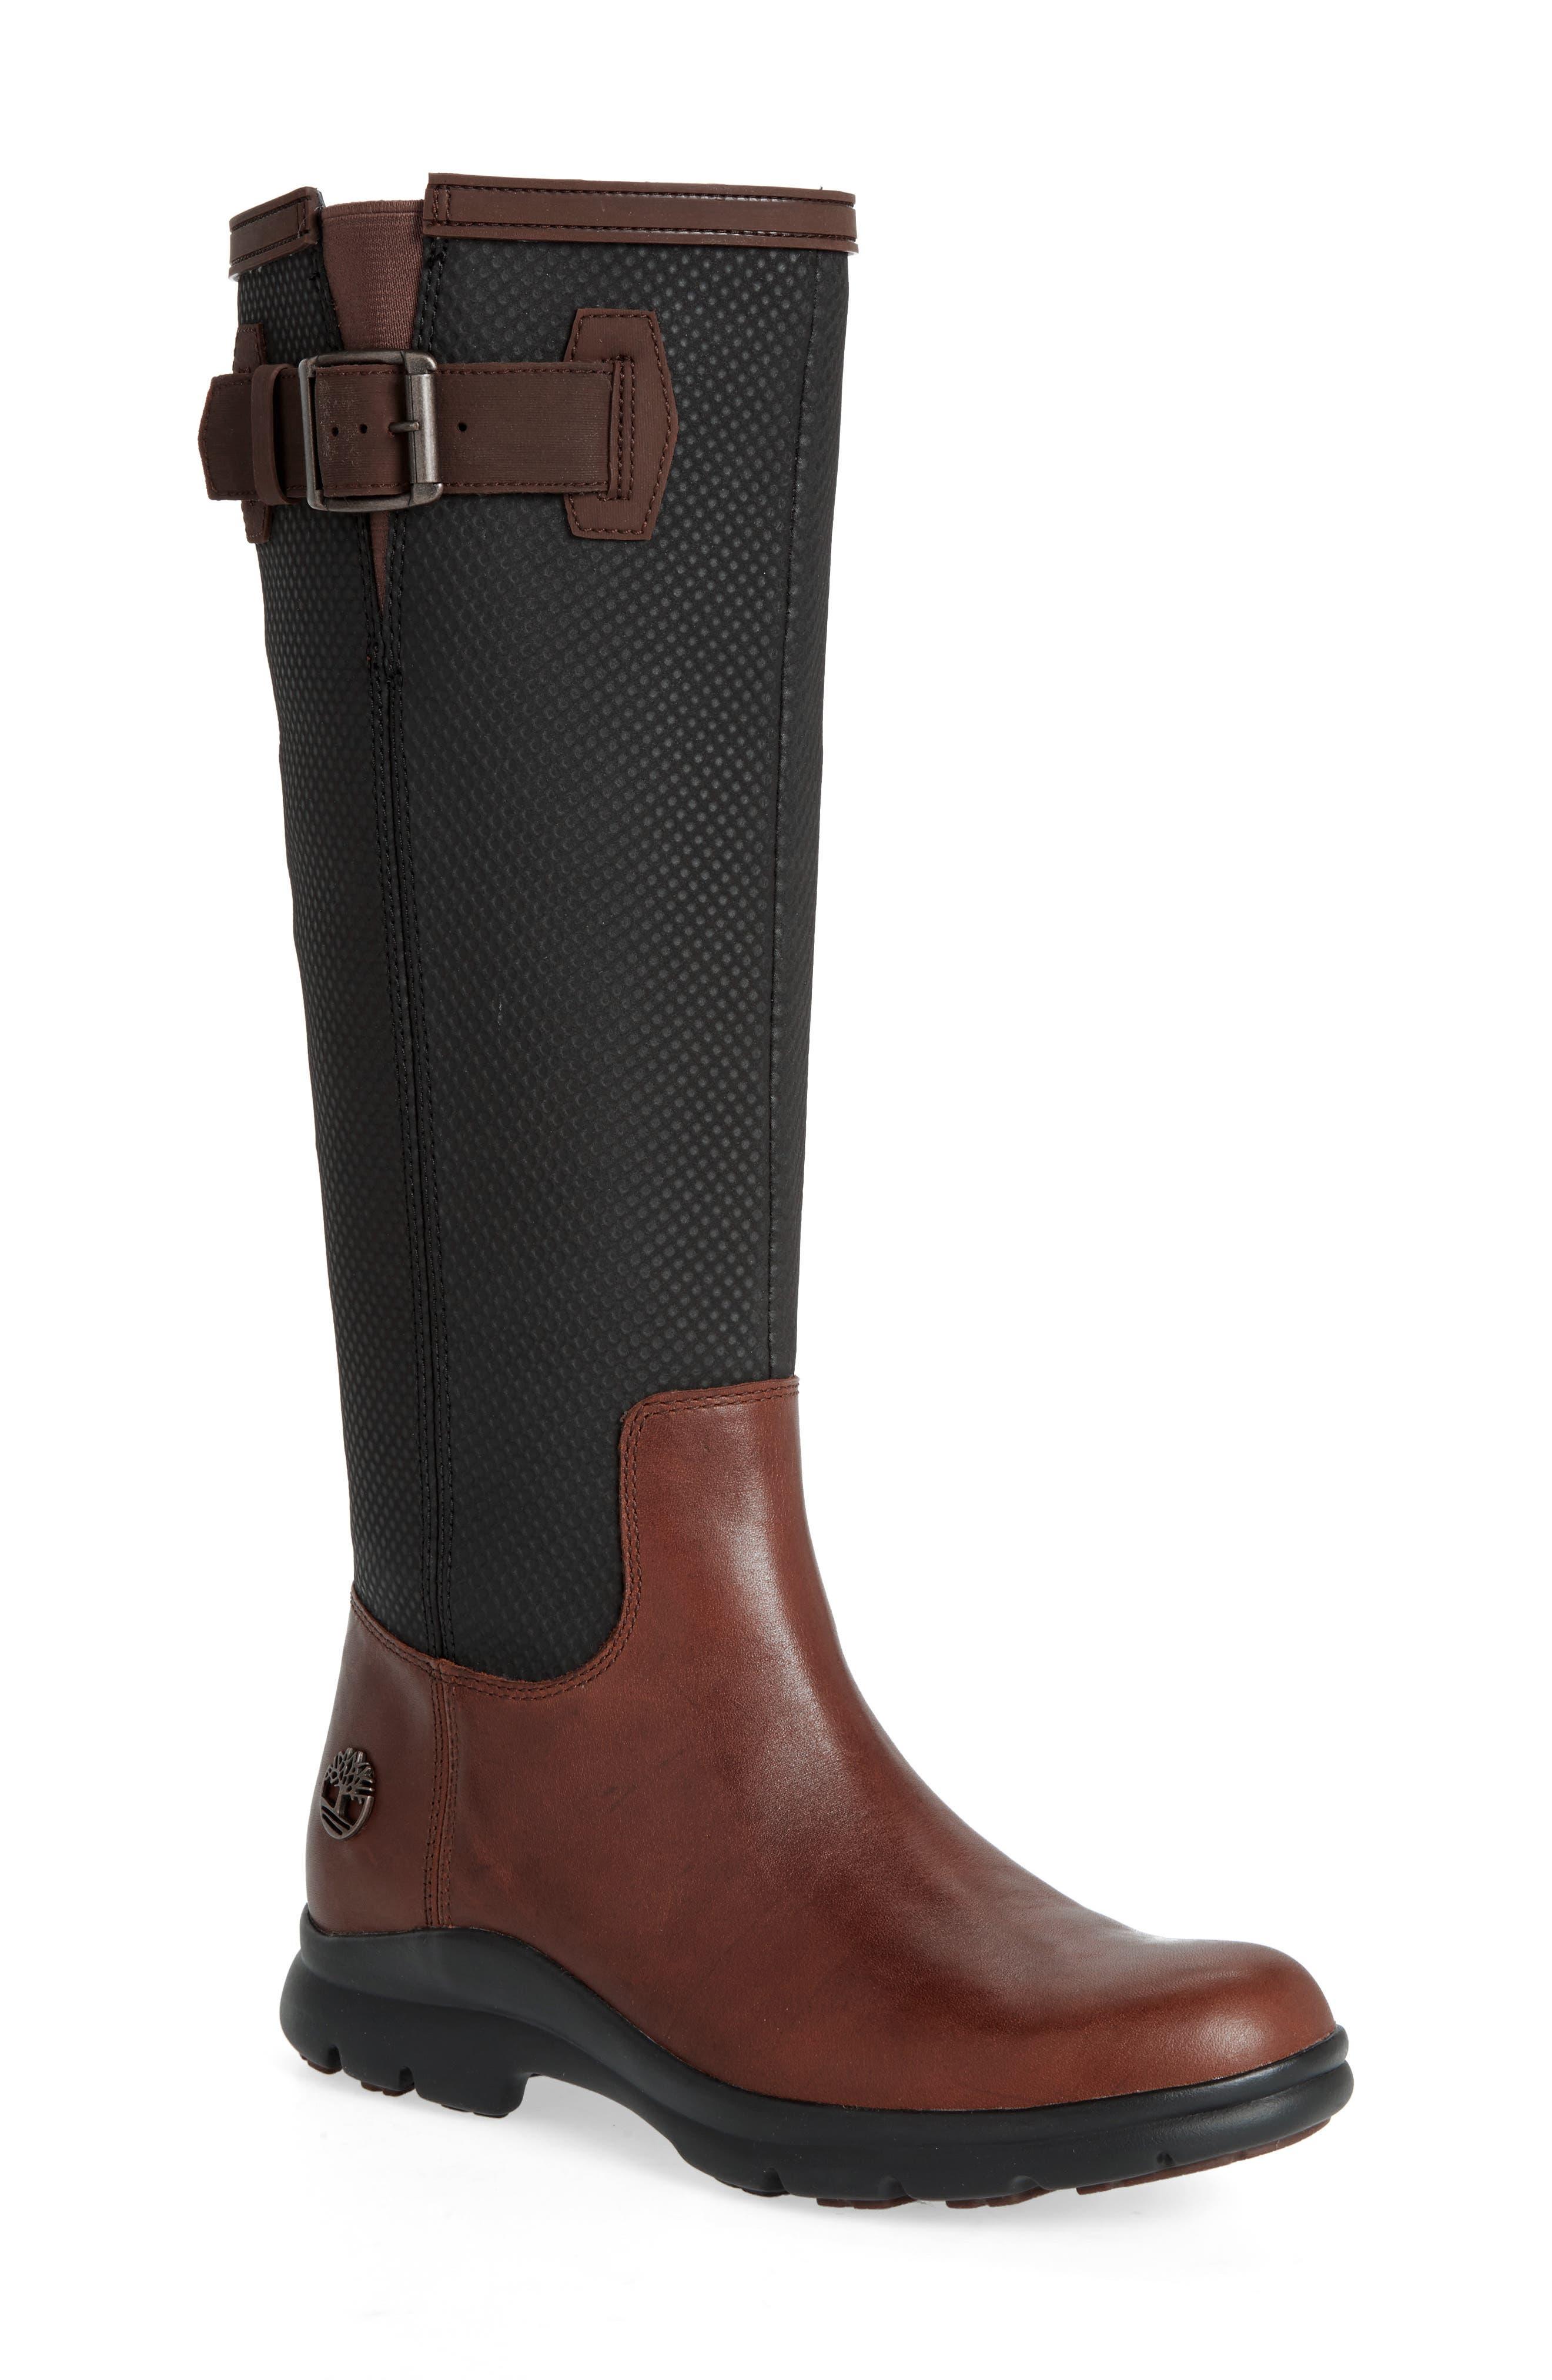 Turain Tall Waterproof Boot,                             Main thumbnail 1, color,                             Medium Brown Leather